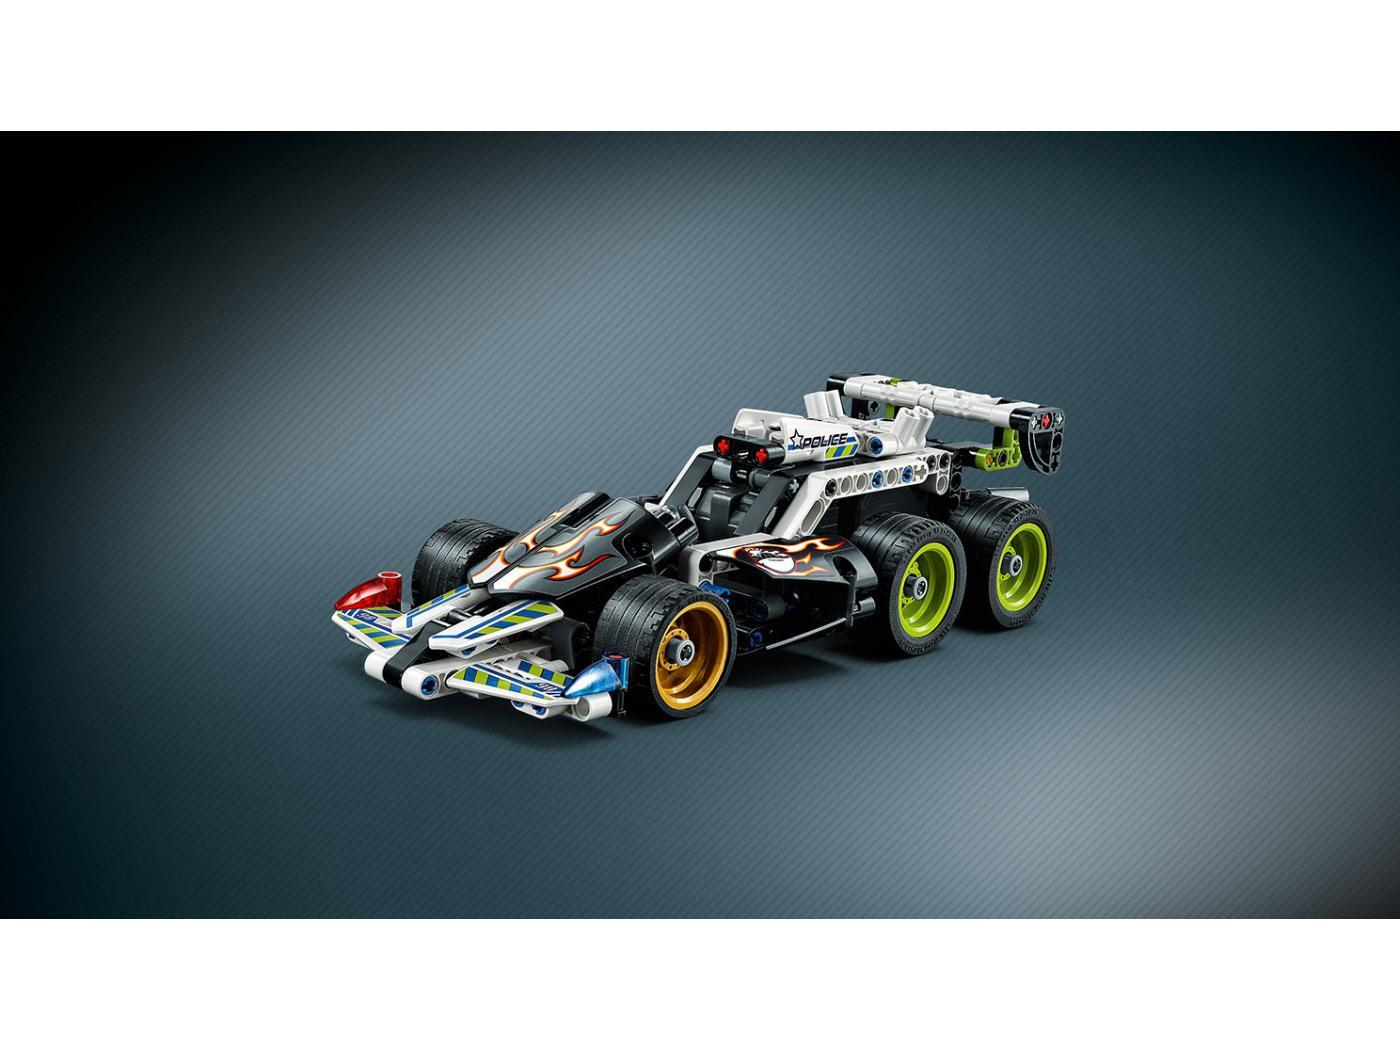 Lego la voiture du fuyard - Lego ninjago voiture ...